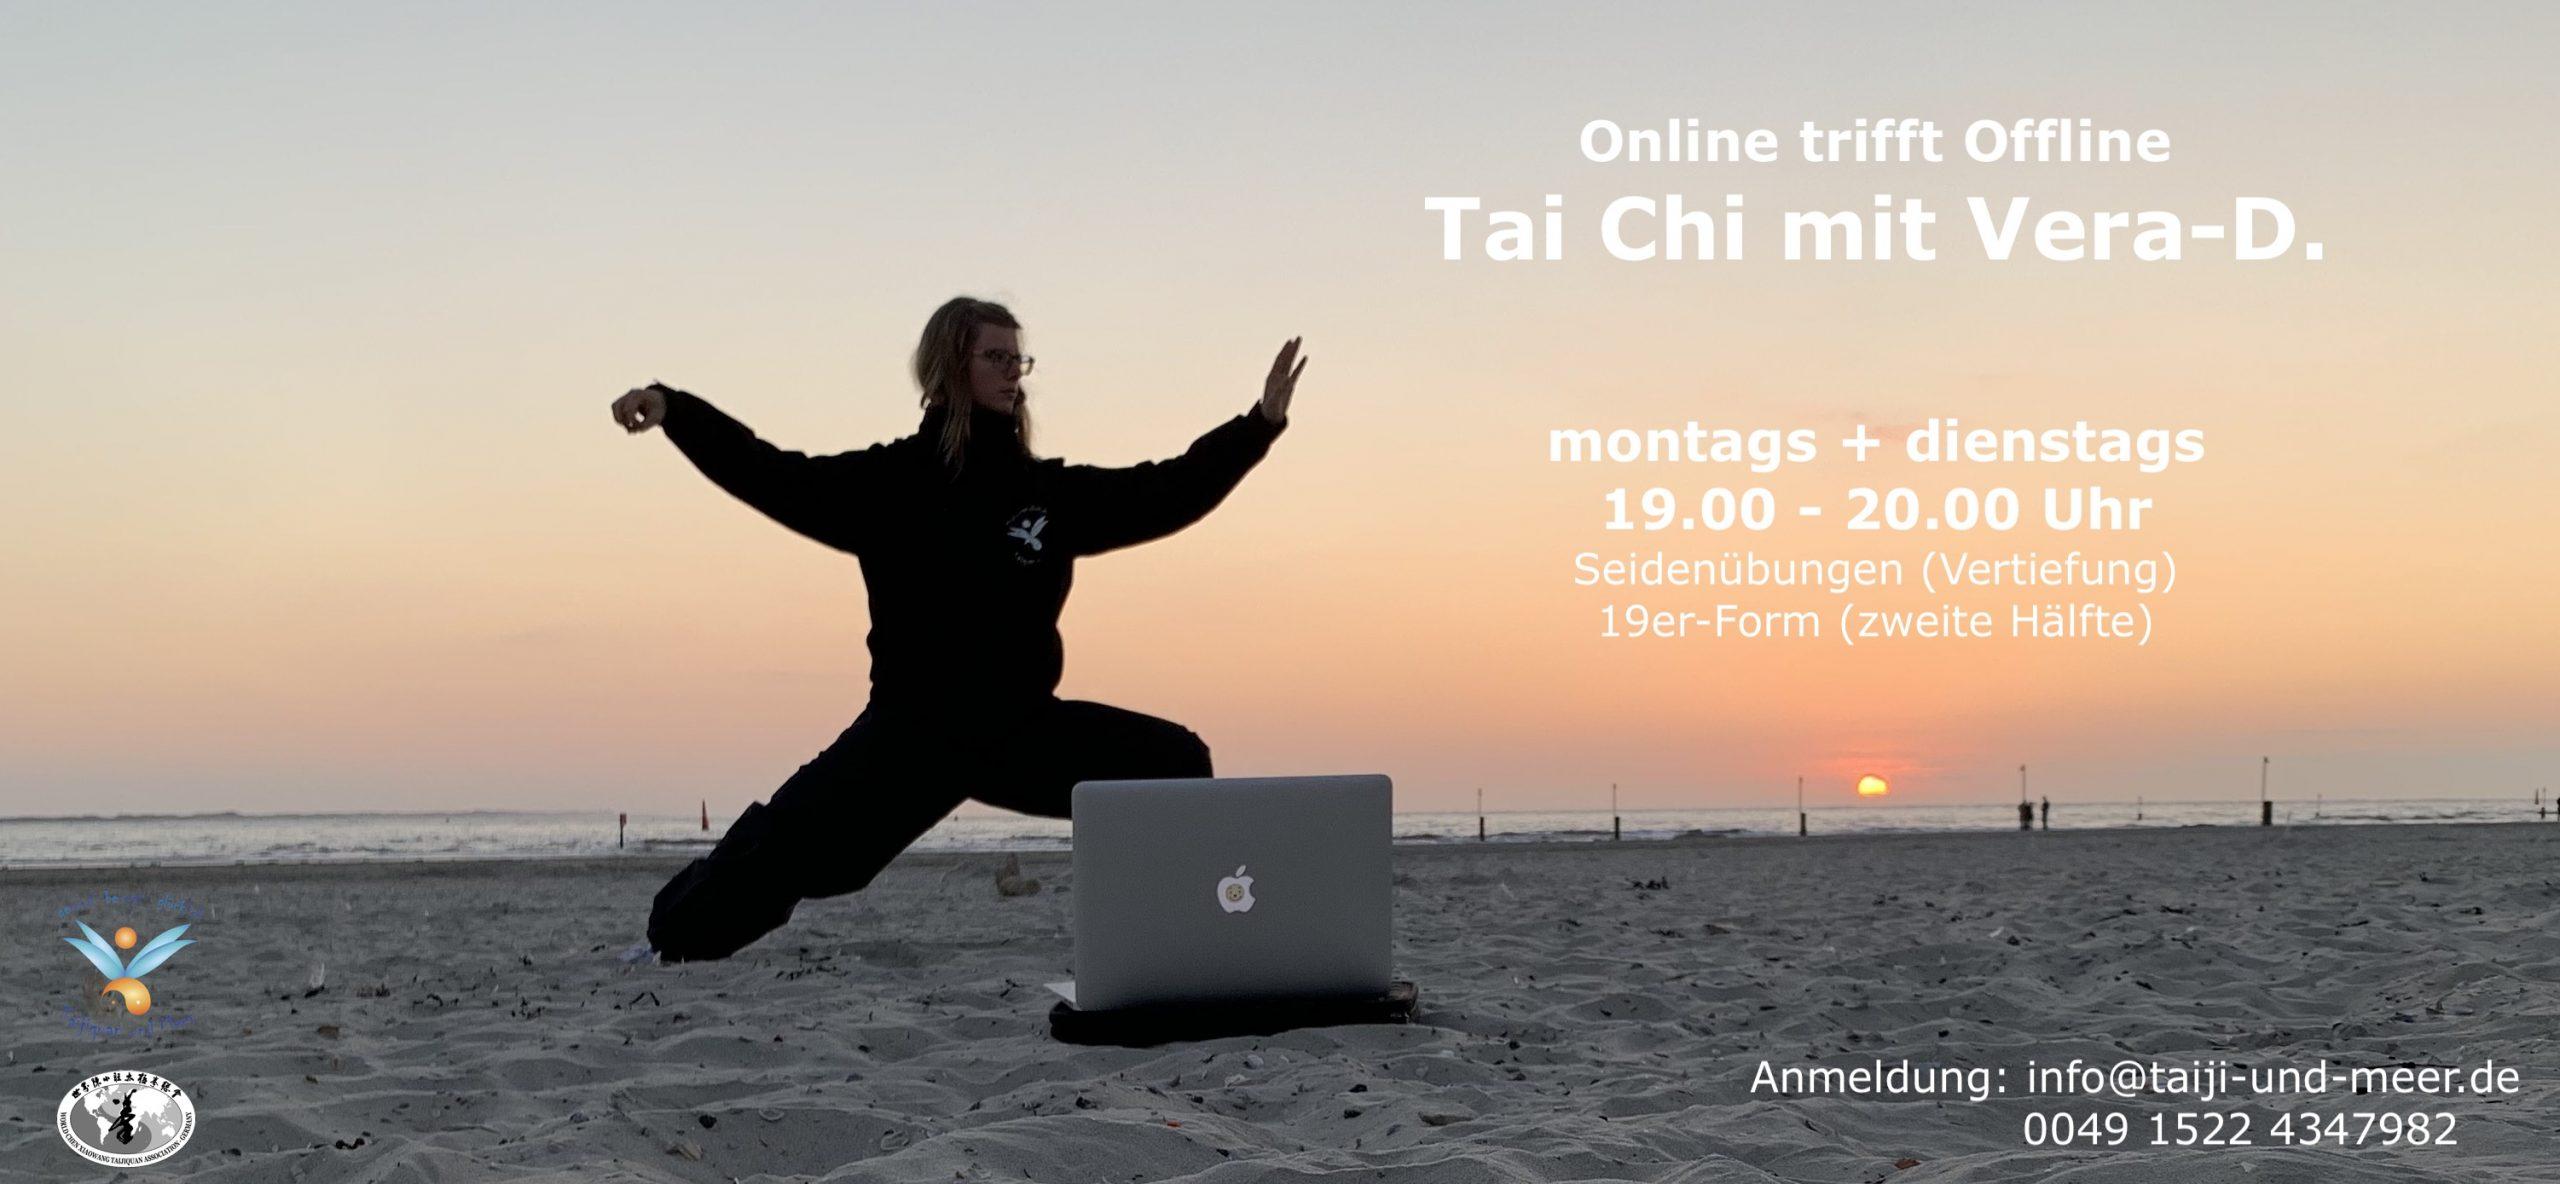 Taiji Tai chi auf Norderney, Gesundheitskurse Ney